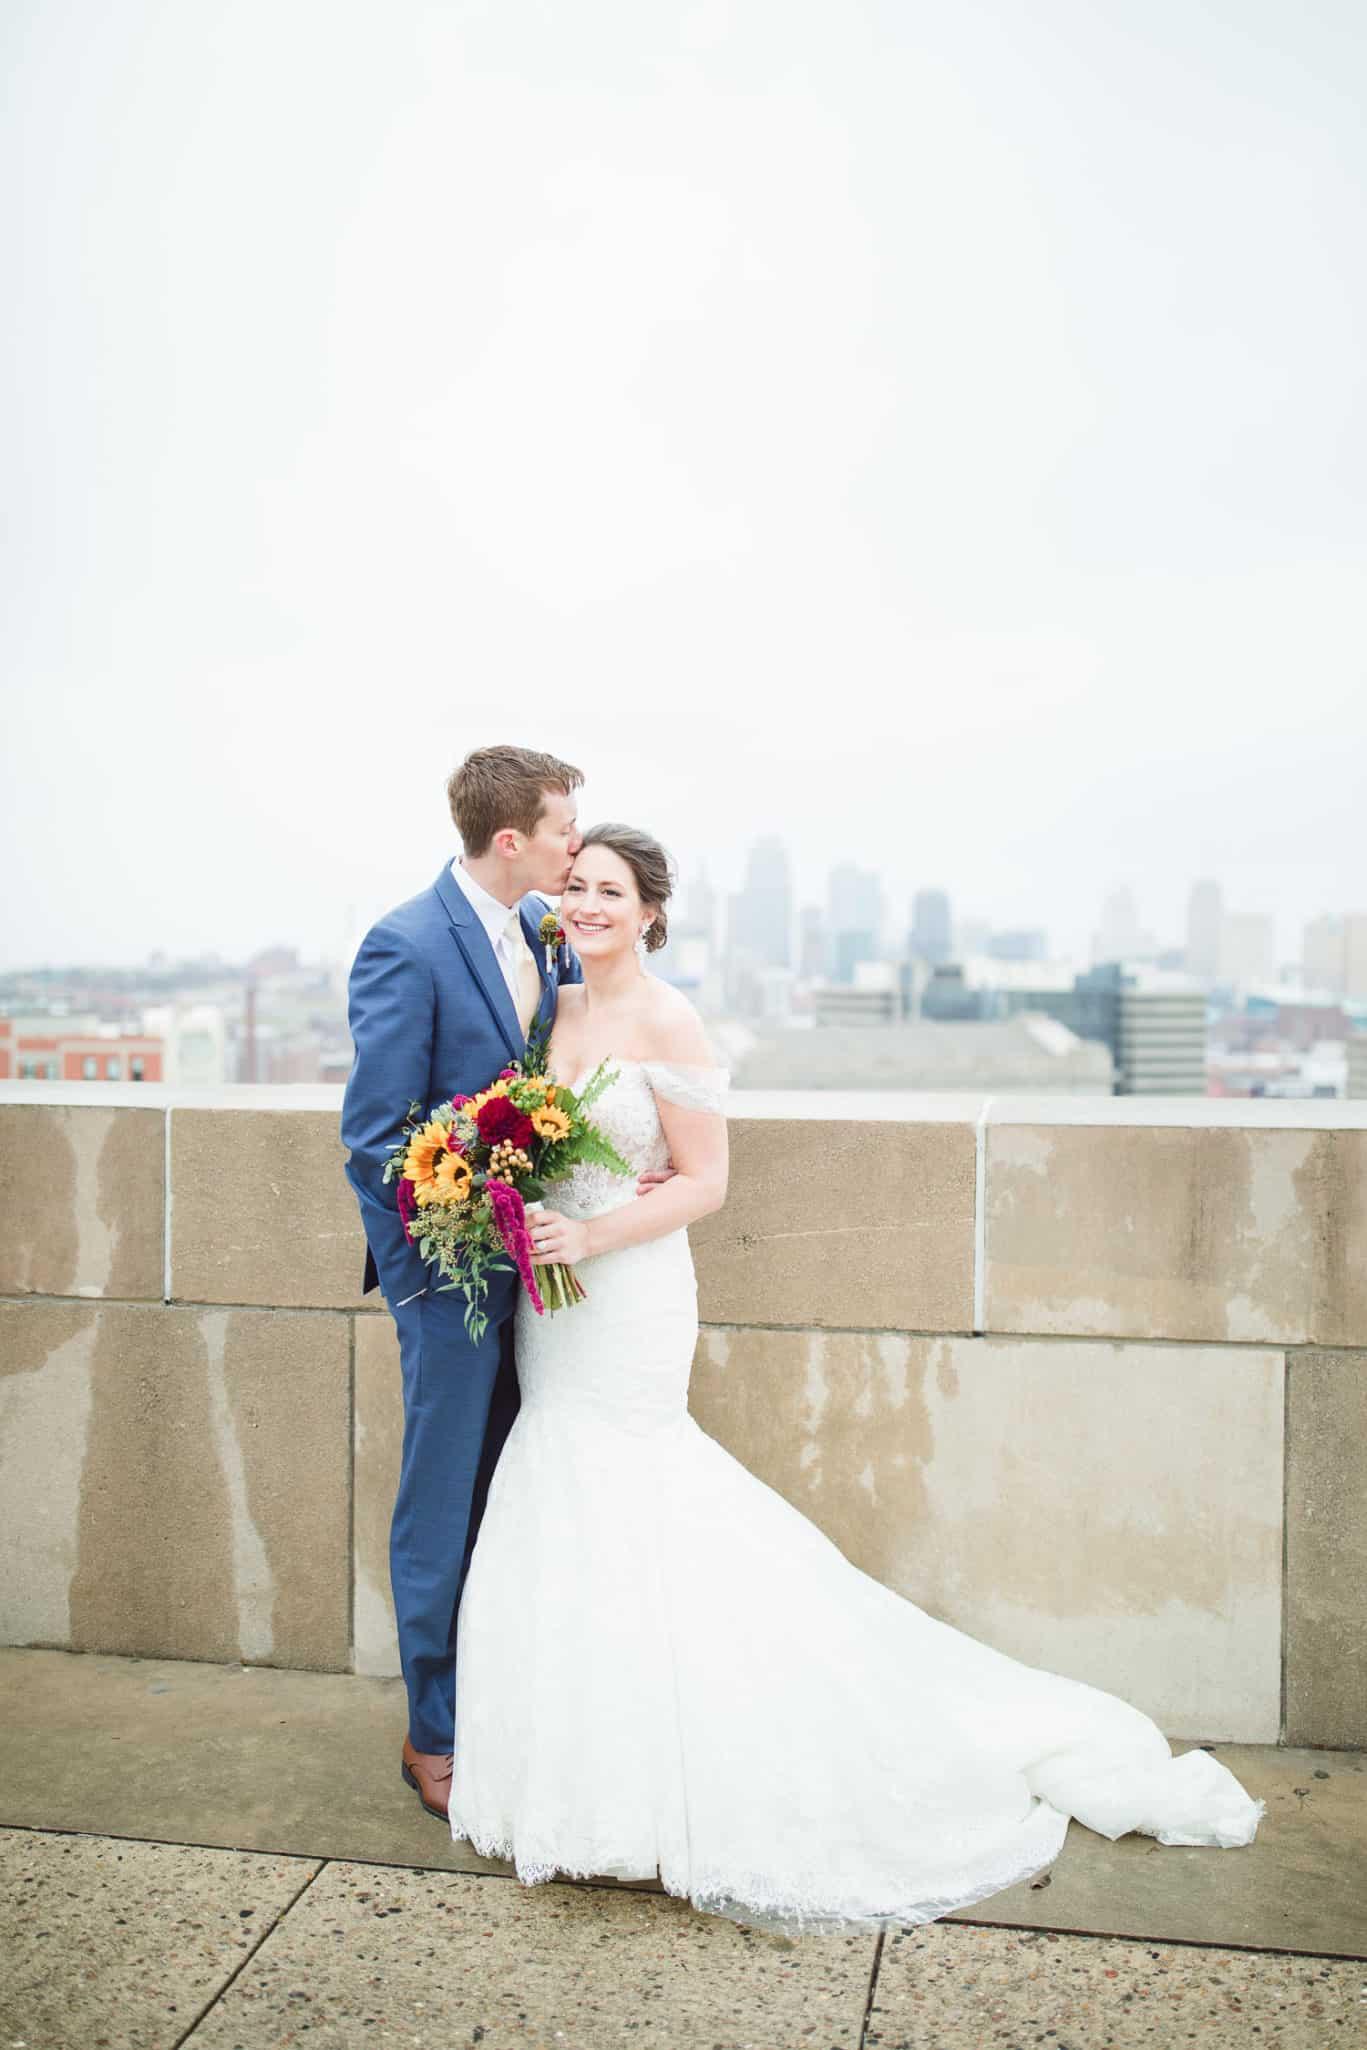 Kansas City wedding photographer wedding portraits at Liberty Memorial in Kansas City